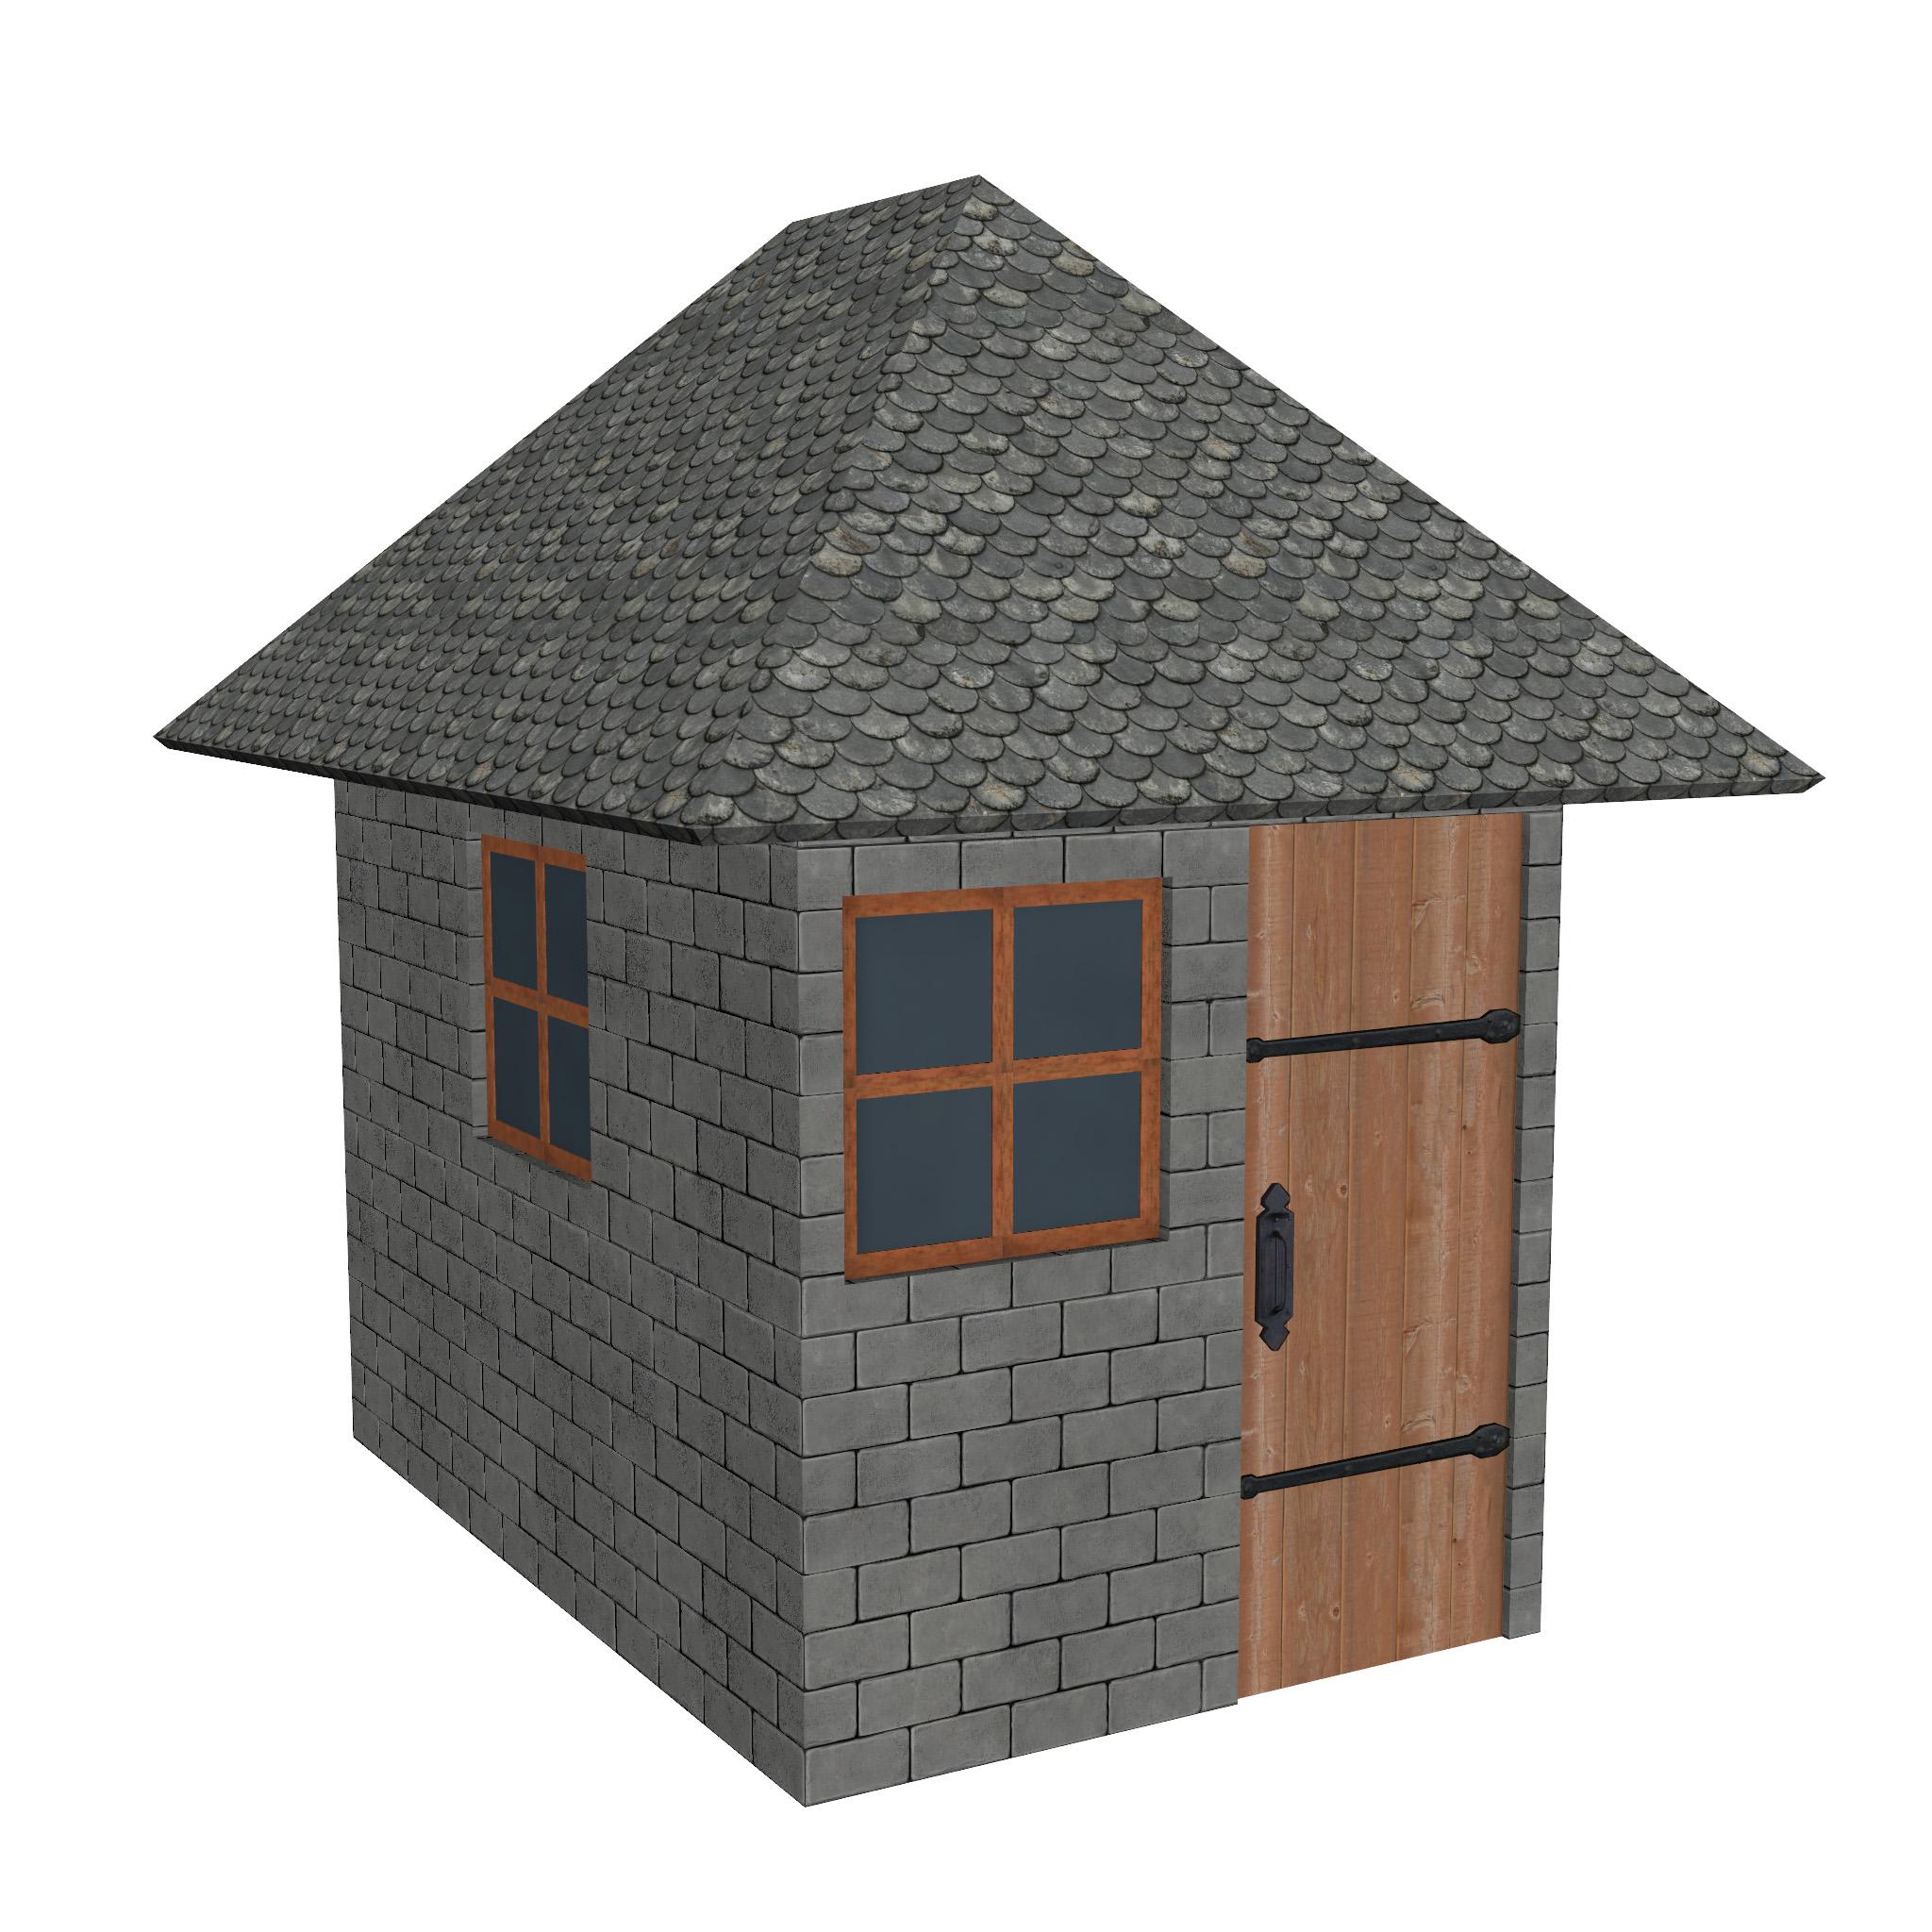 modular brick house set 3d model fbx ma mb 271416